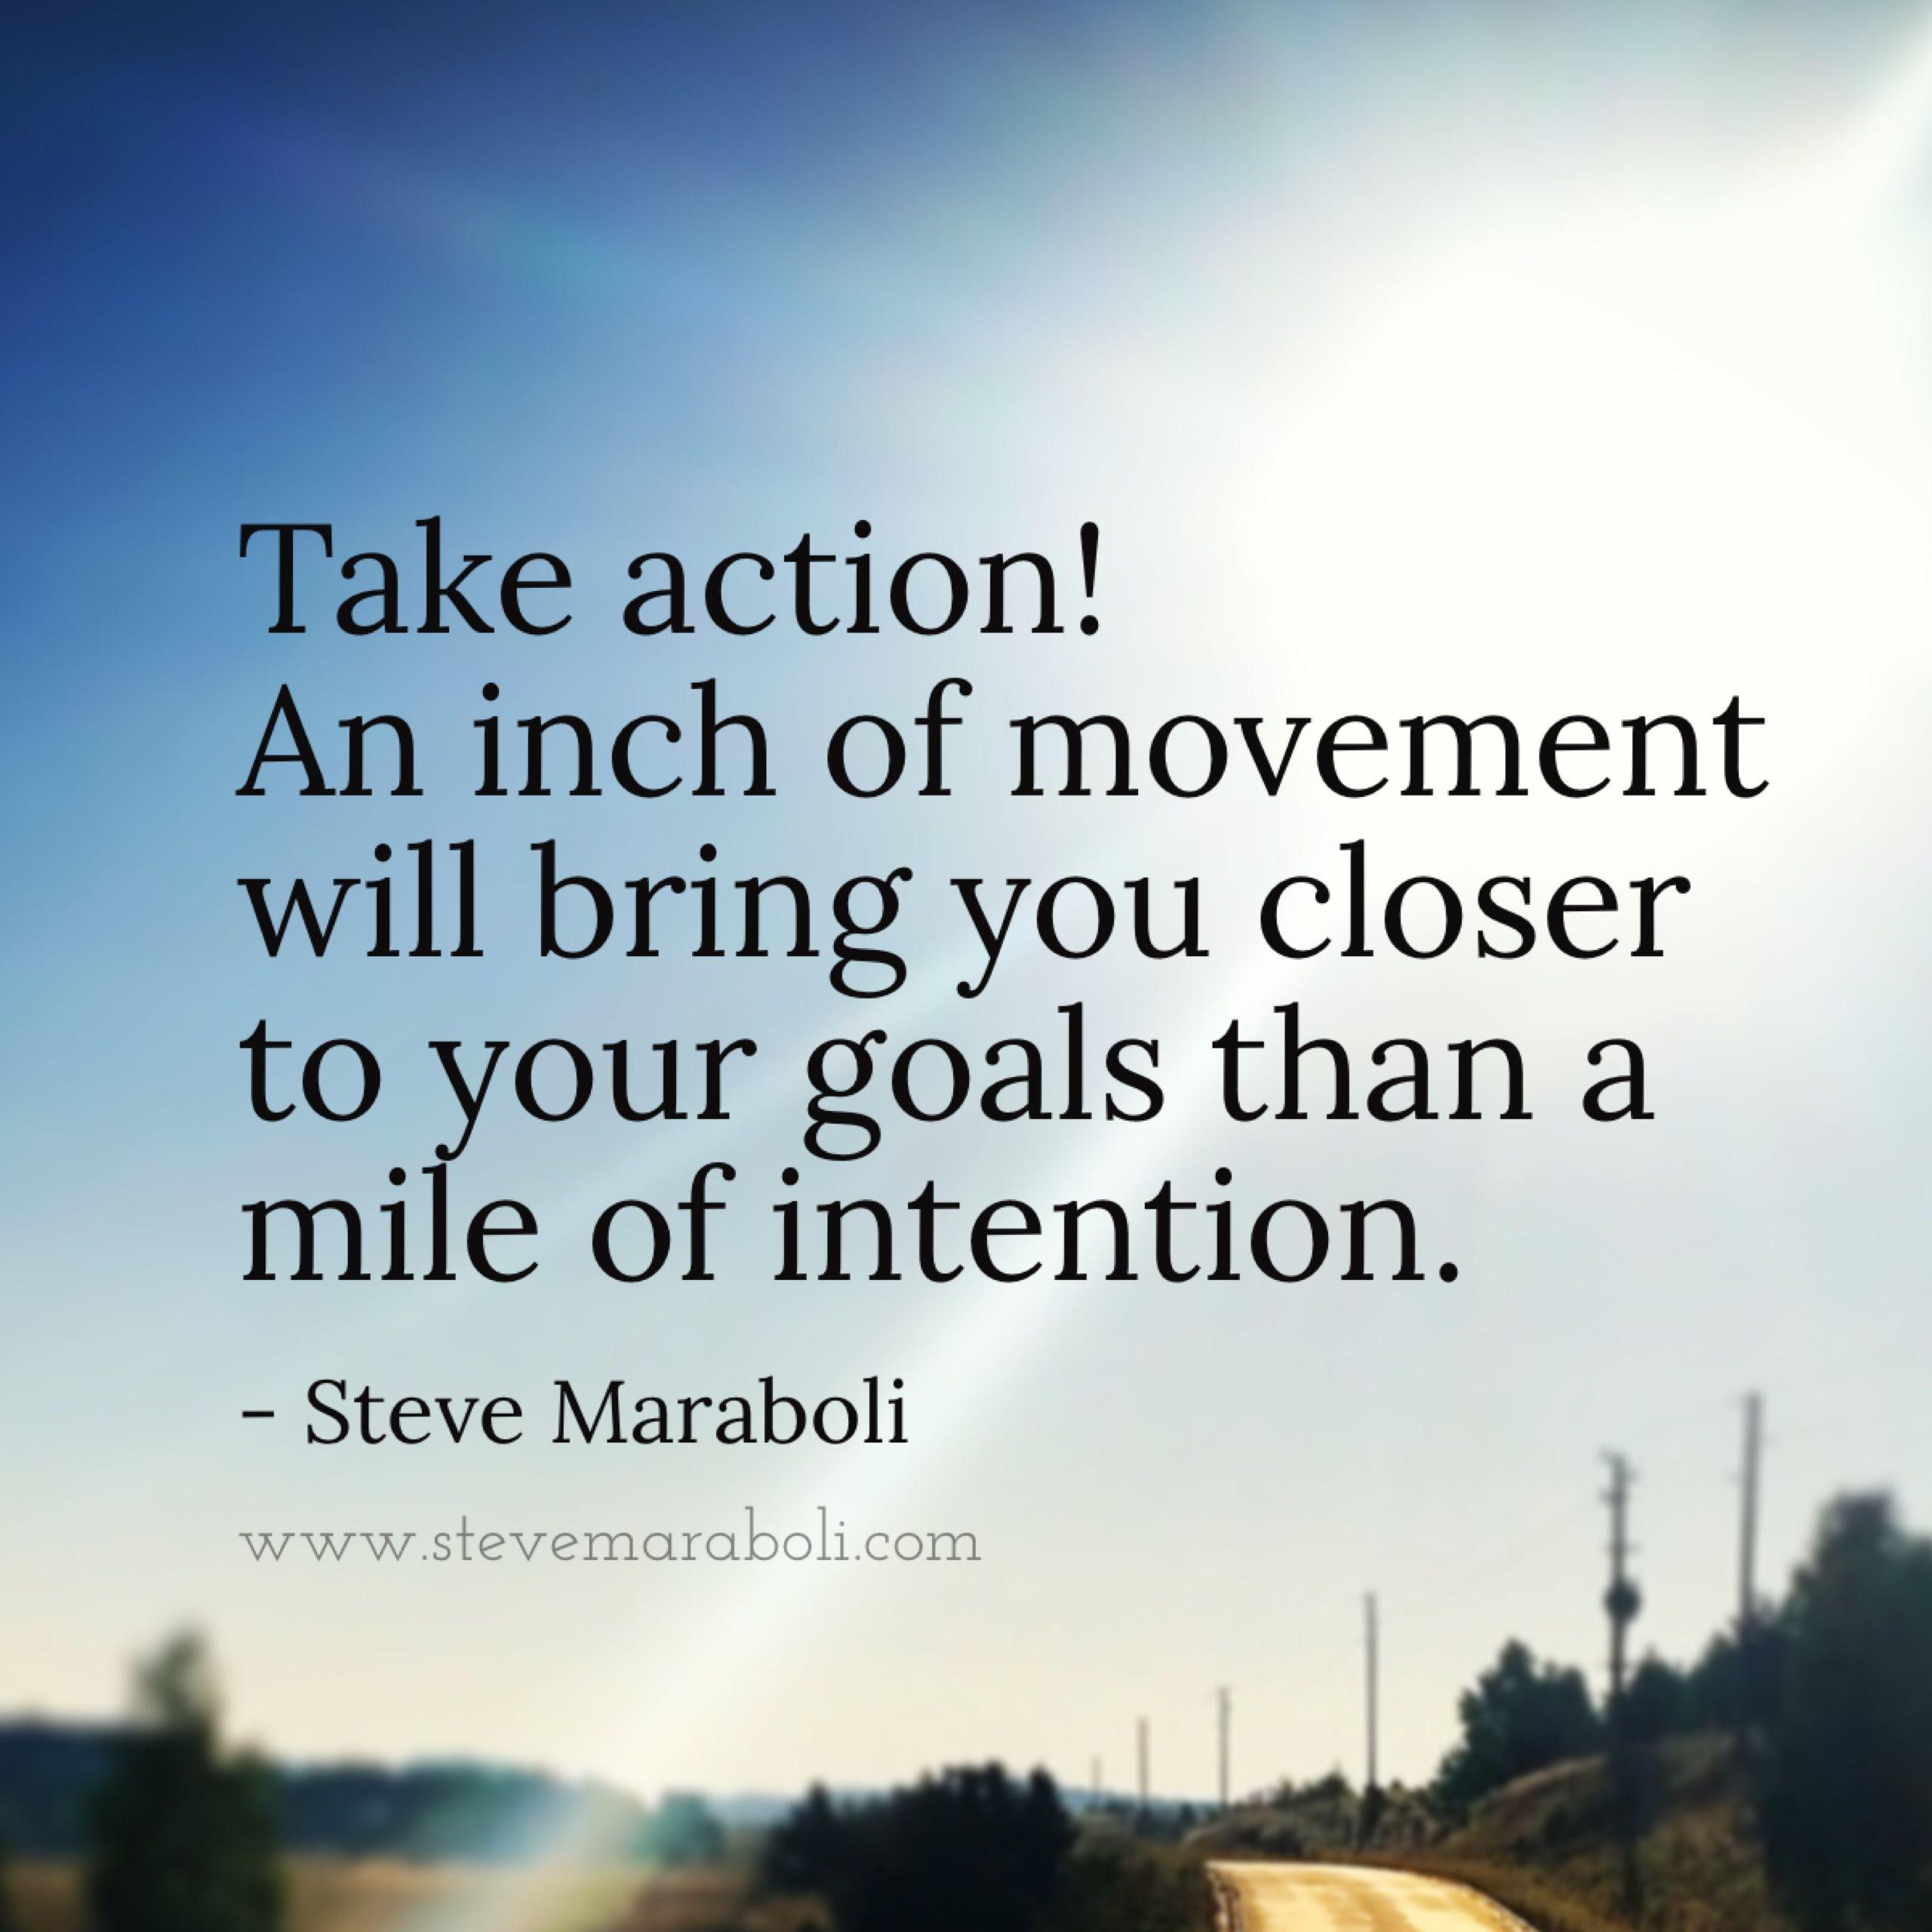 Movement Quotes Dreams And Goals Quotes  Steve Maraboli  Inspiration